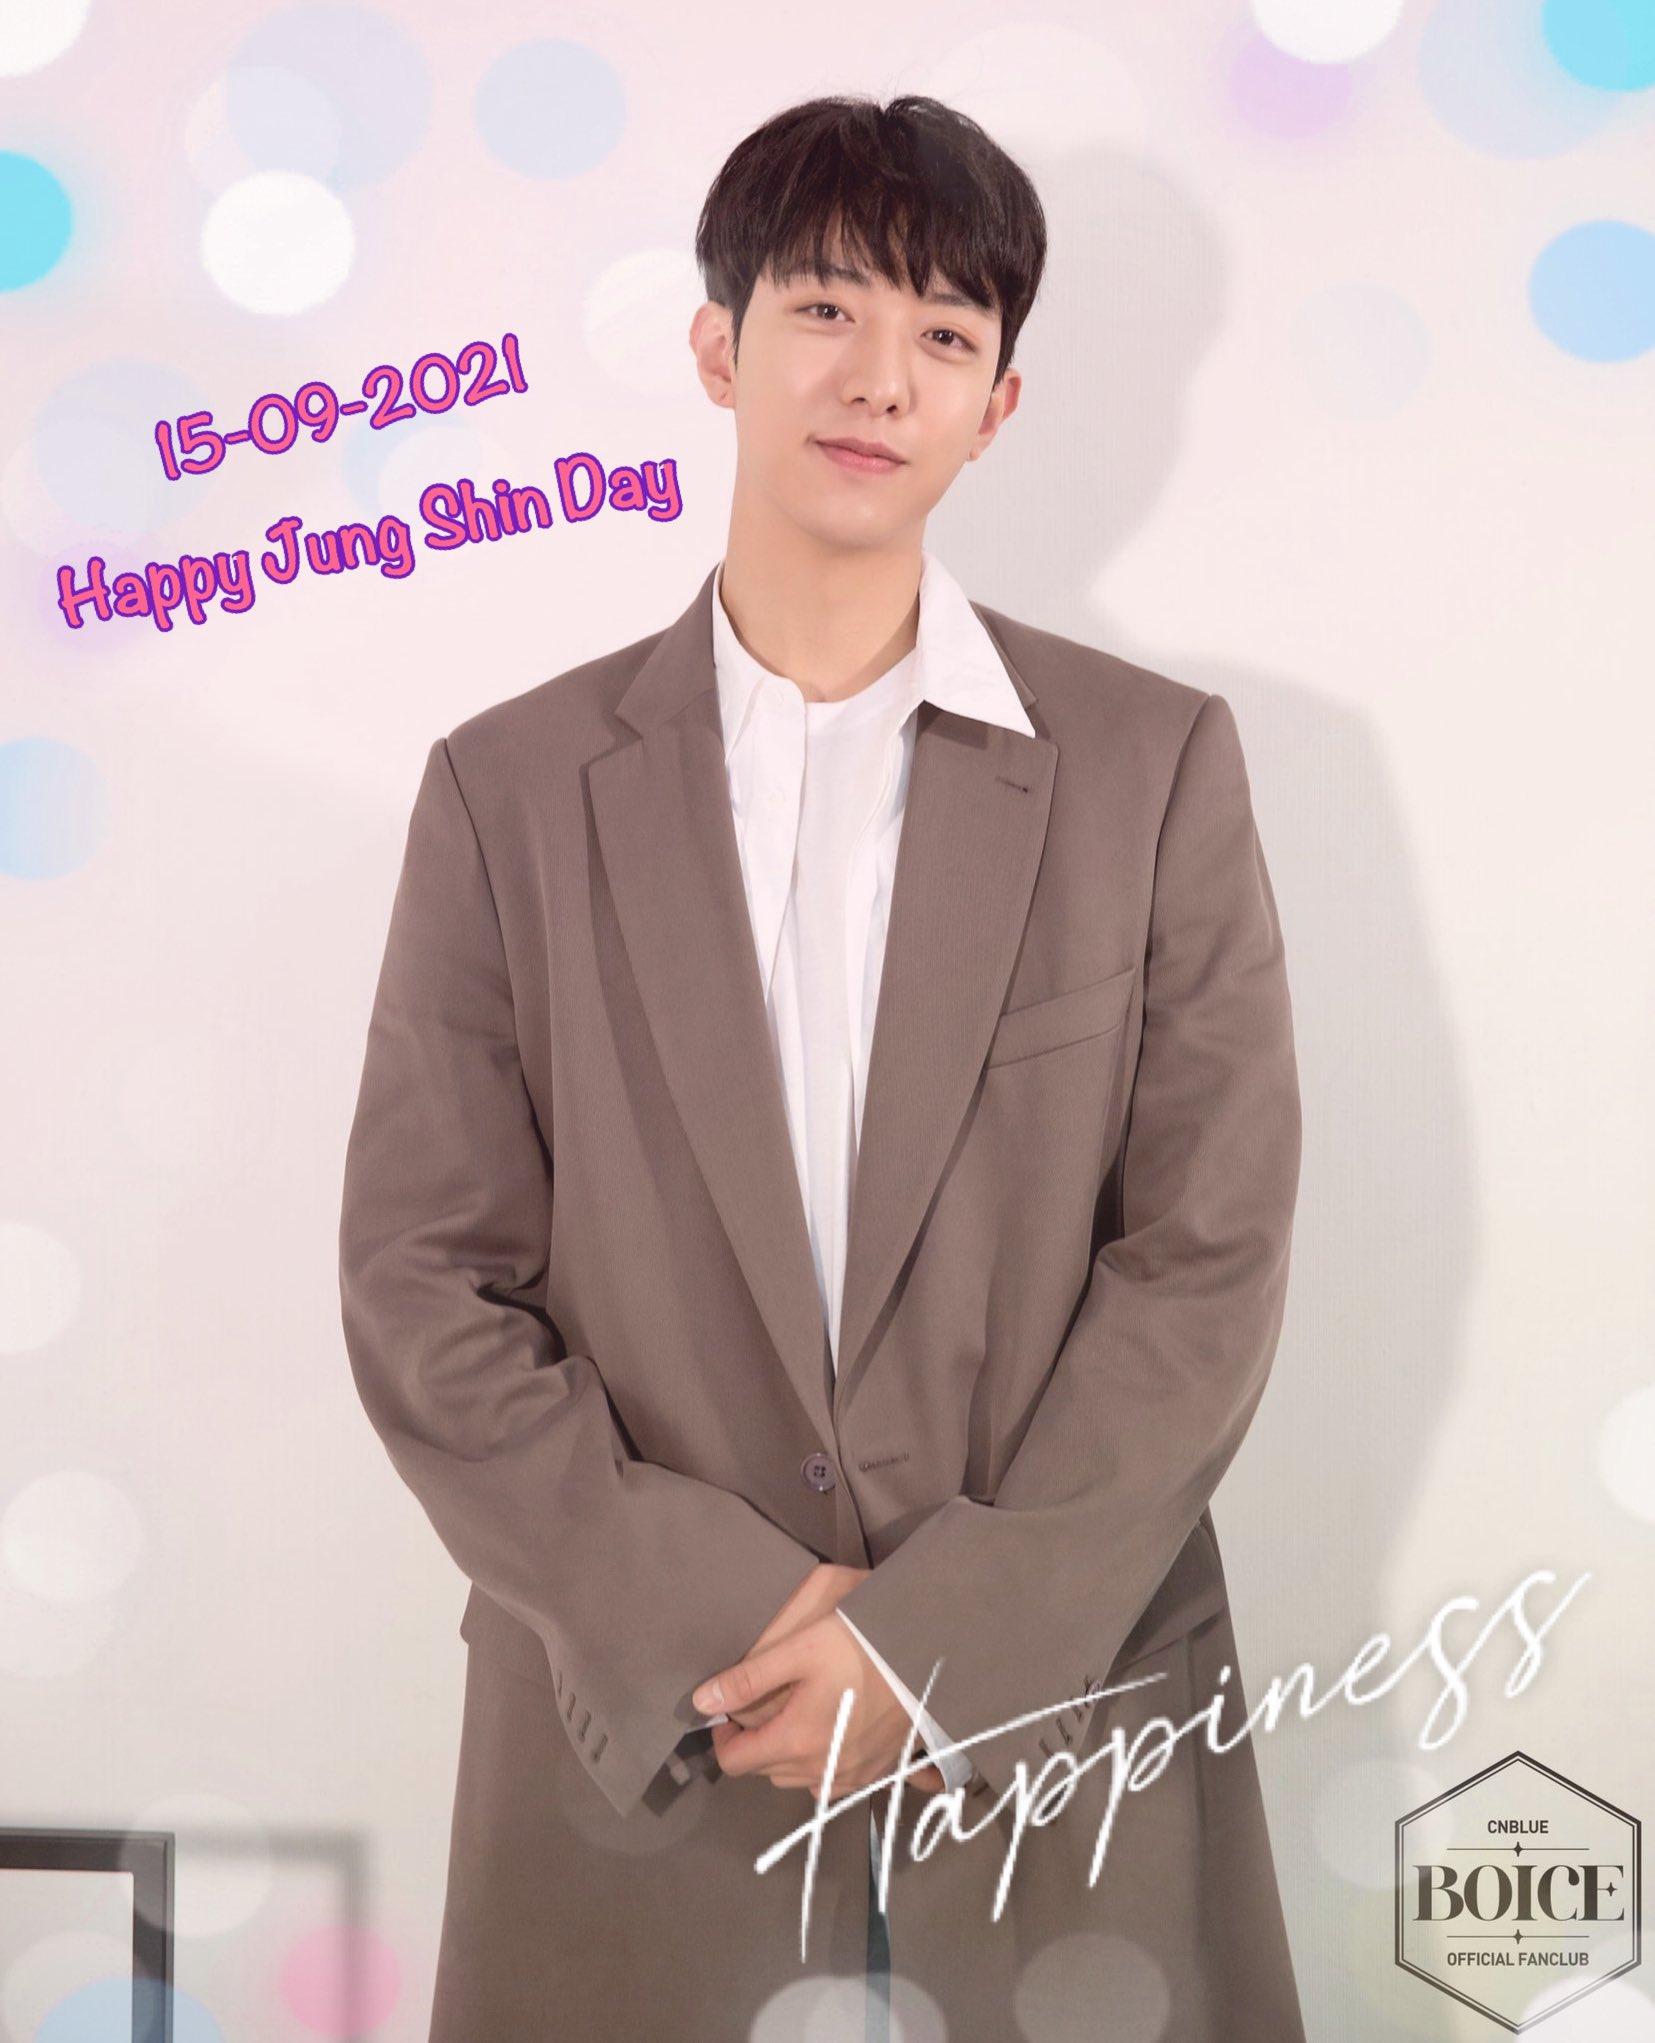 Happy birthday Lee Jung Shin 15-09-2021